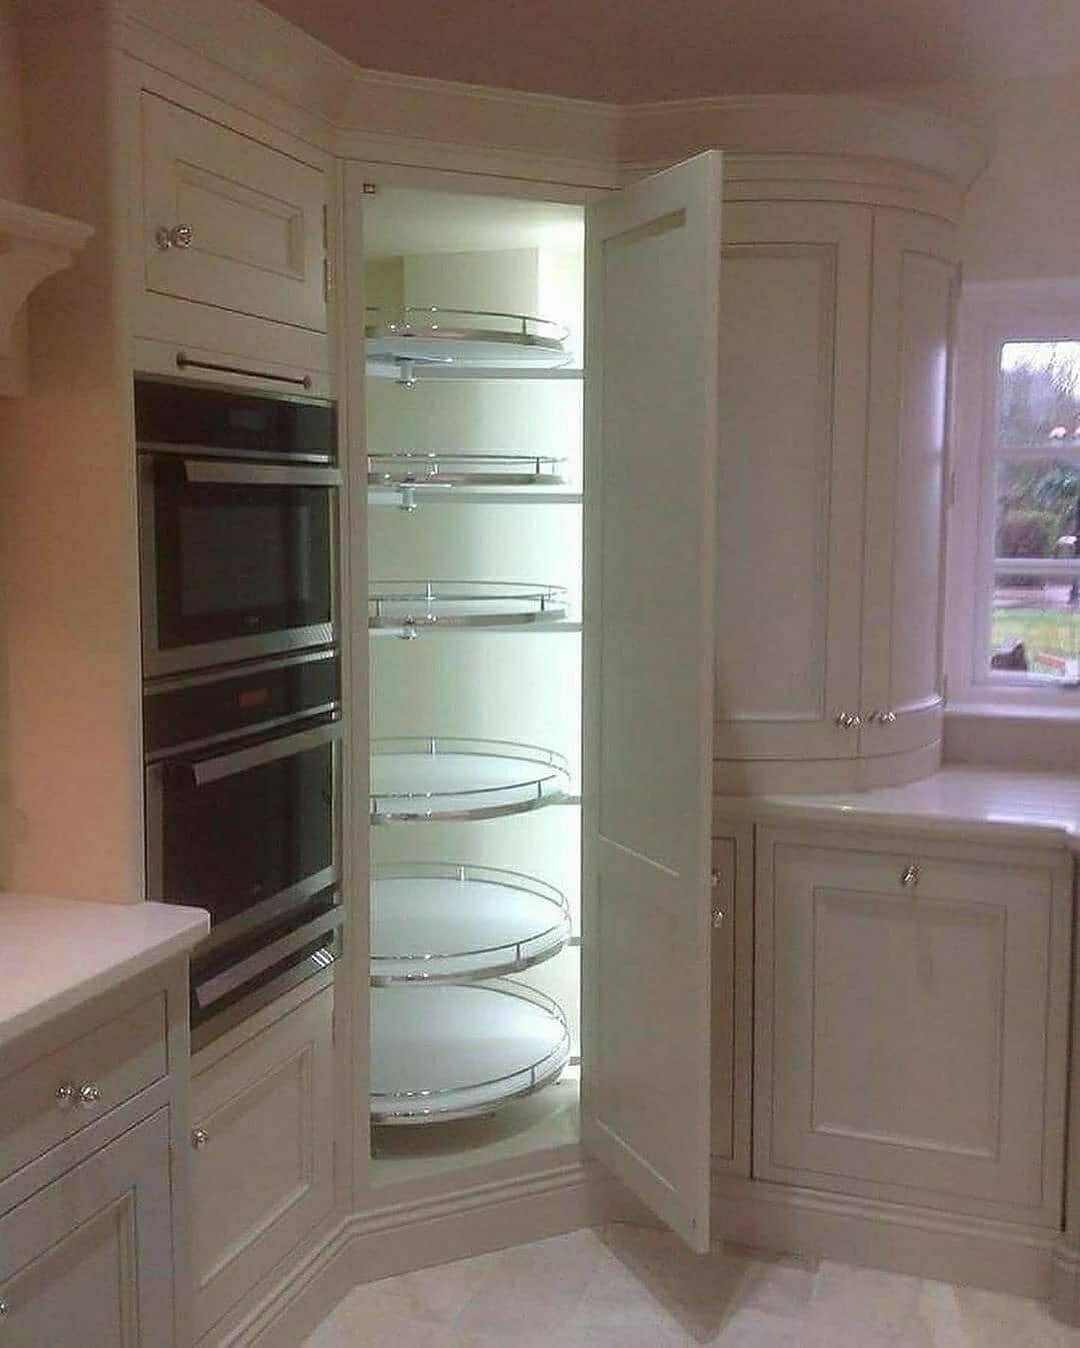 1 290 Curtidas 15 Comentarios عرض عقارتكم Decor Jojo2 No Instagram ارفف التخزين في المطبخ Cozinha Divertida Cozinha